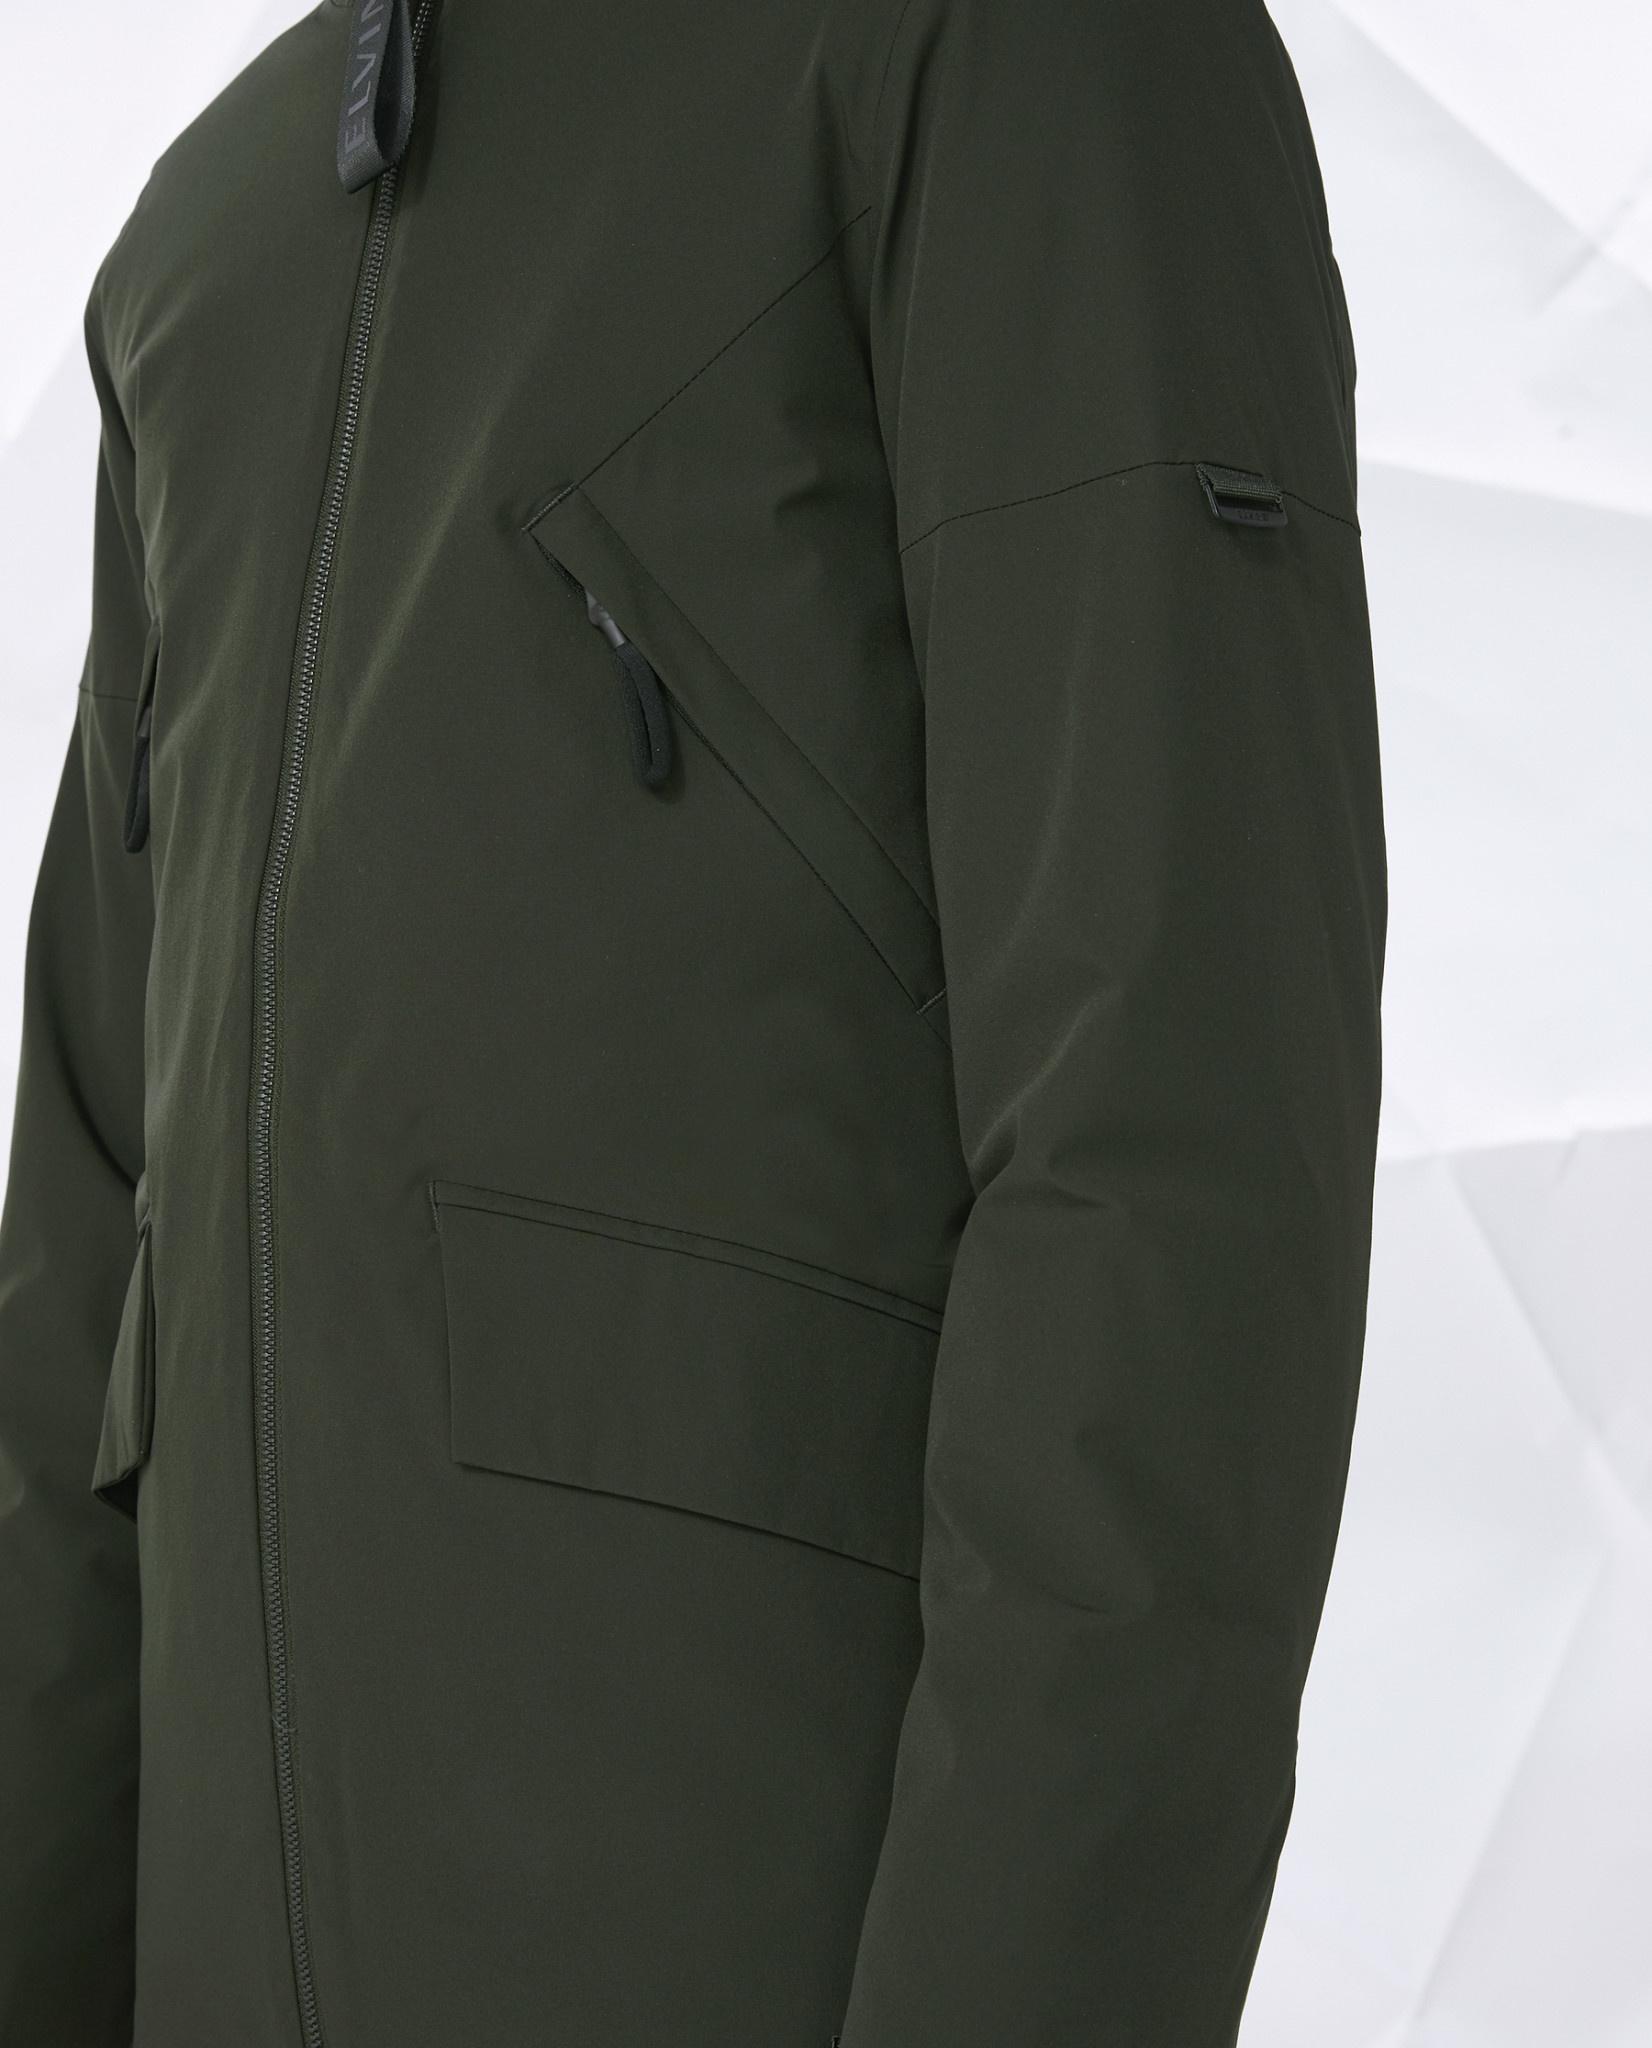 Elvine Elvine Cole Function Stretch Jacket Khaki Green